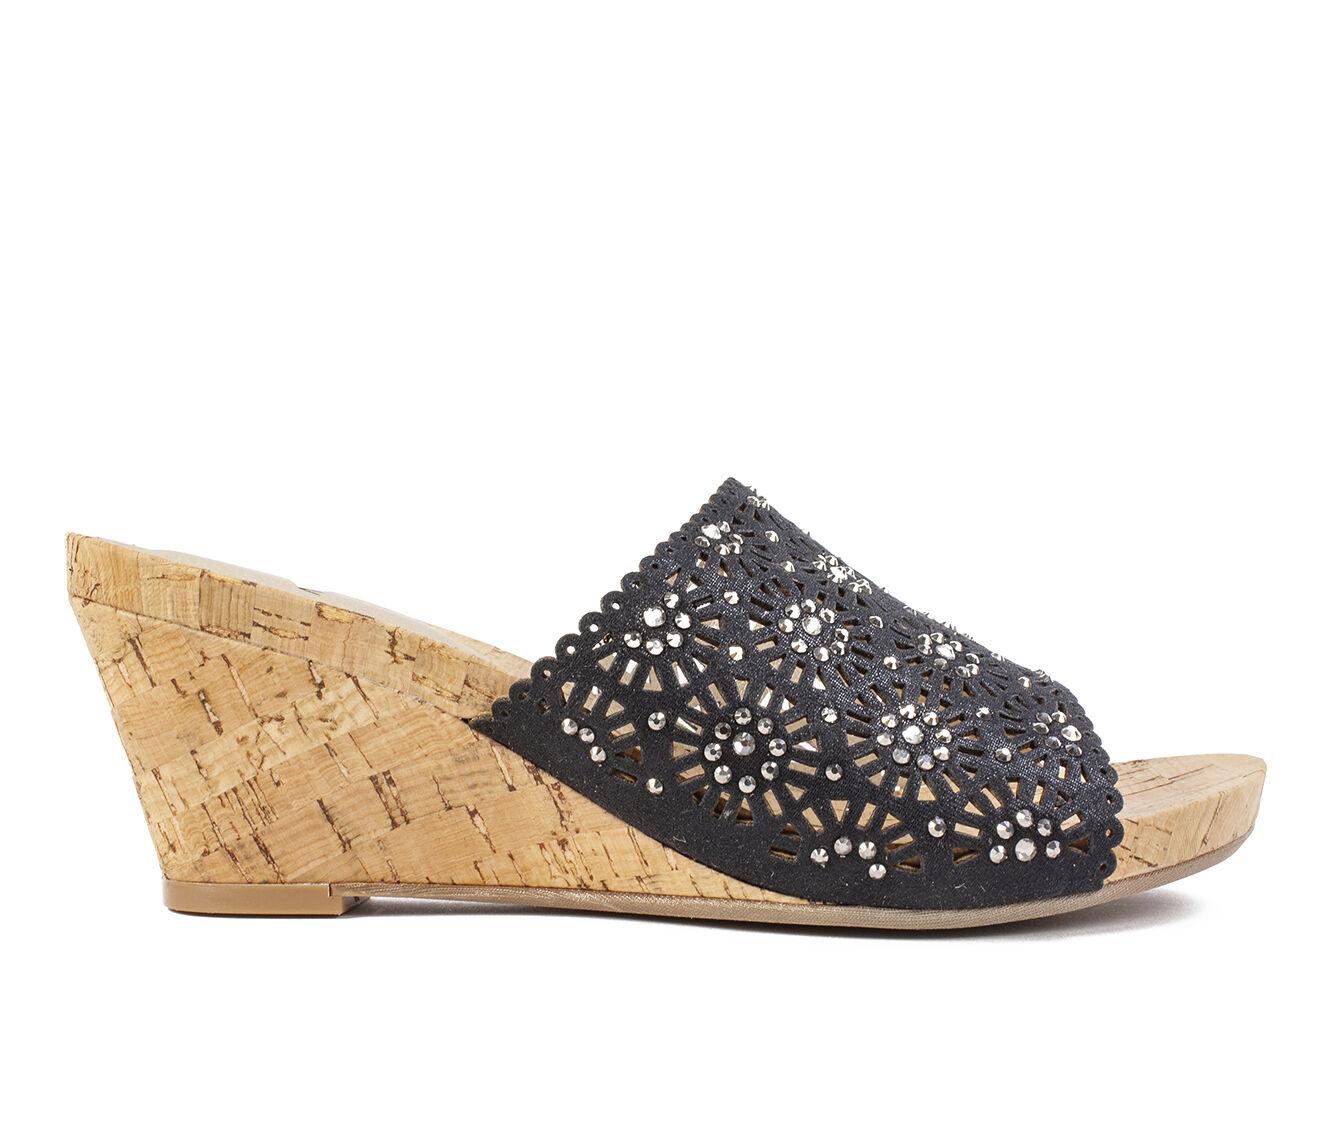 uk shoes_kd6709